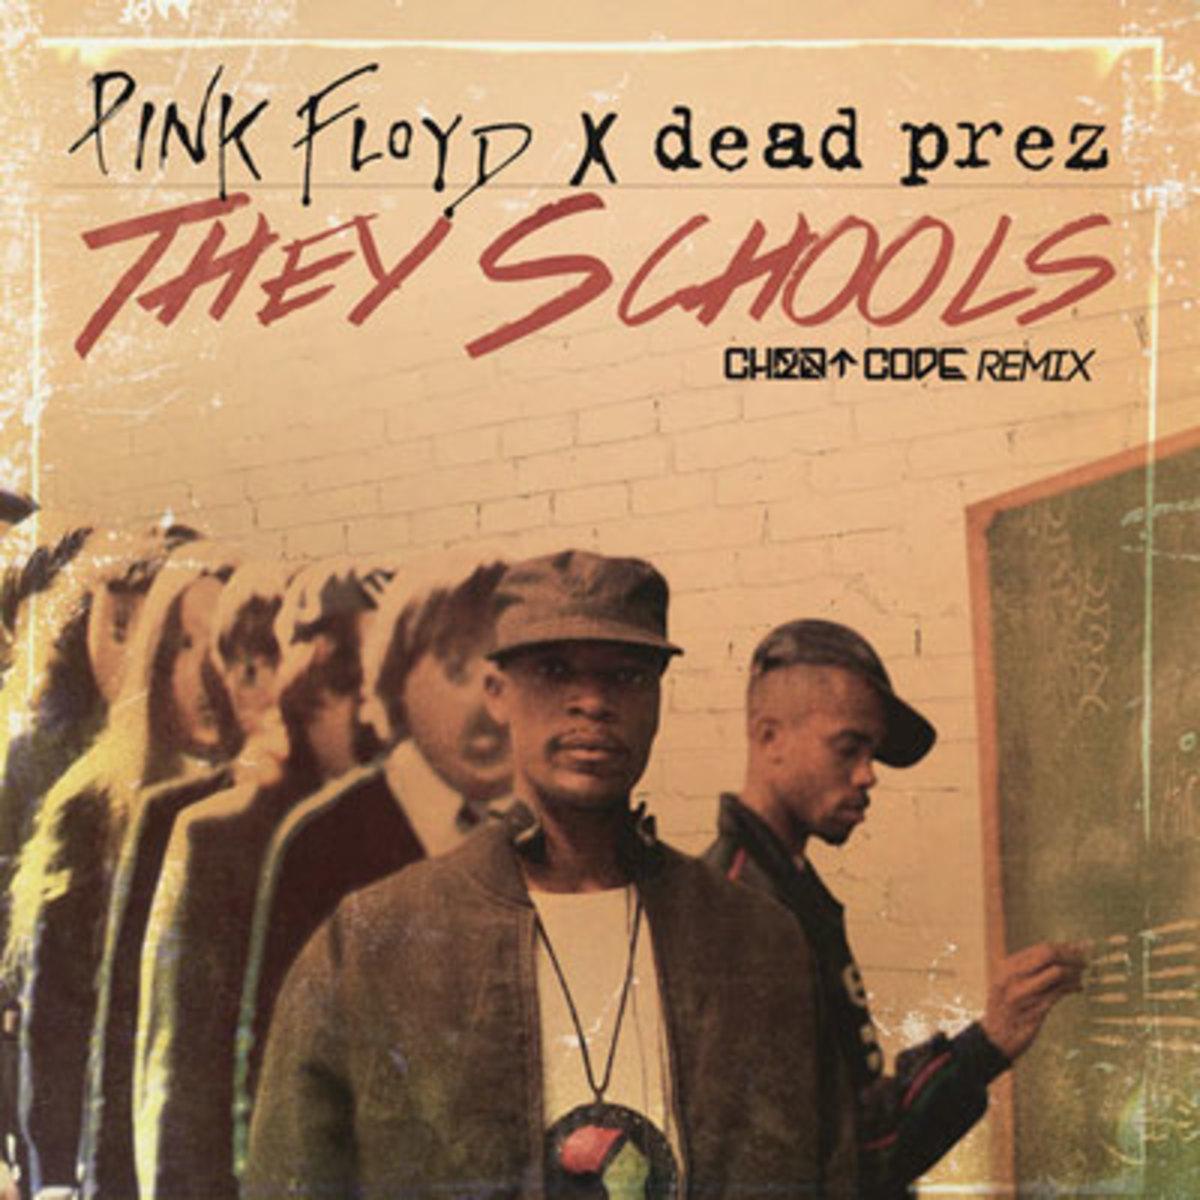 pinkdead-theyschoolsrmx.jpg